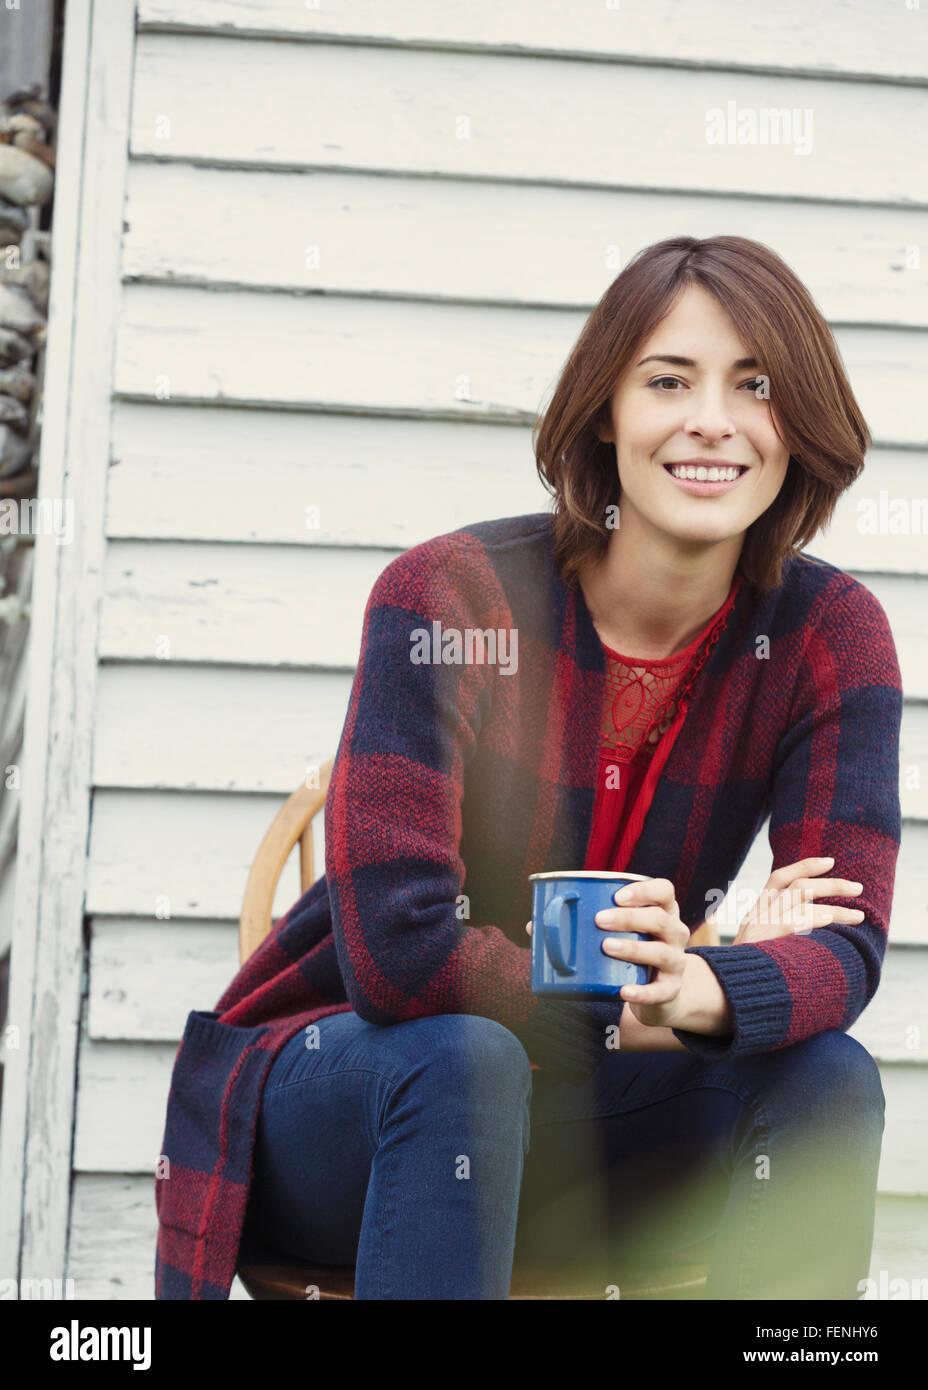 Porträt lächelnde Brünette Frau Kaffeetrinken im freien Stockbild